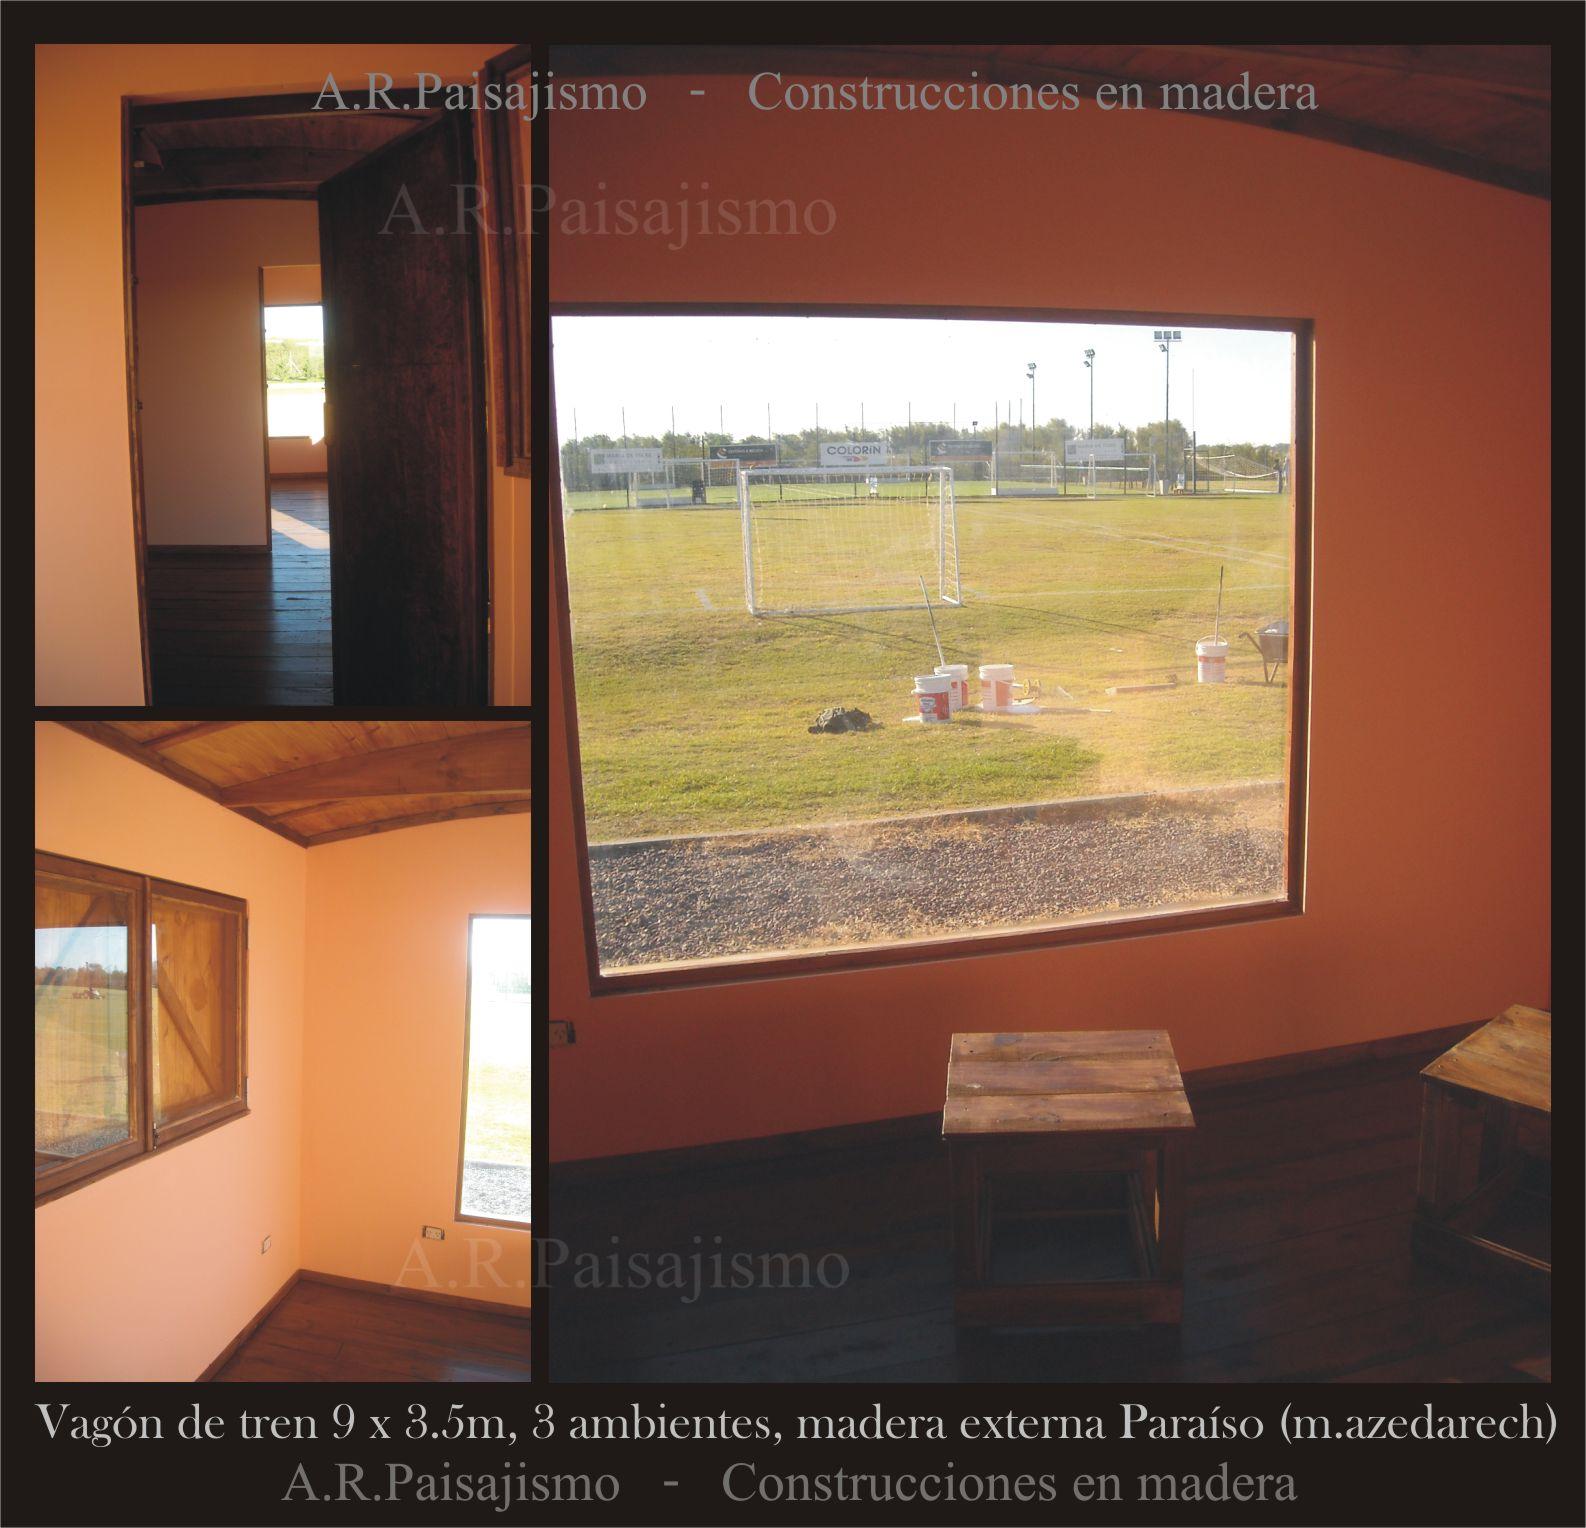 Tren De Madera Replica Vagon Tipo Deposito Solo Casco 30m2  # Muebles Alto Pehuen